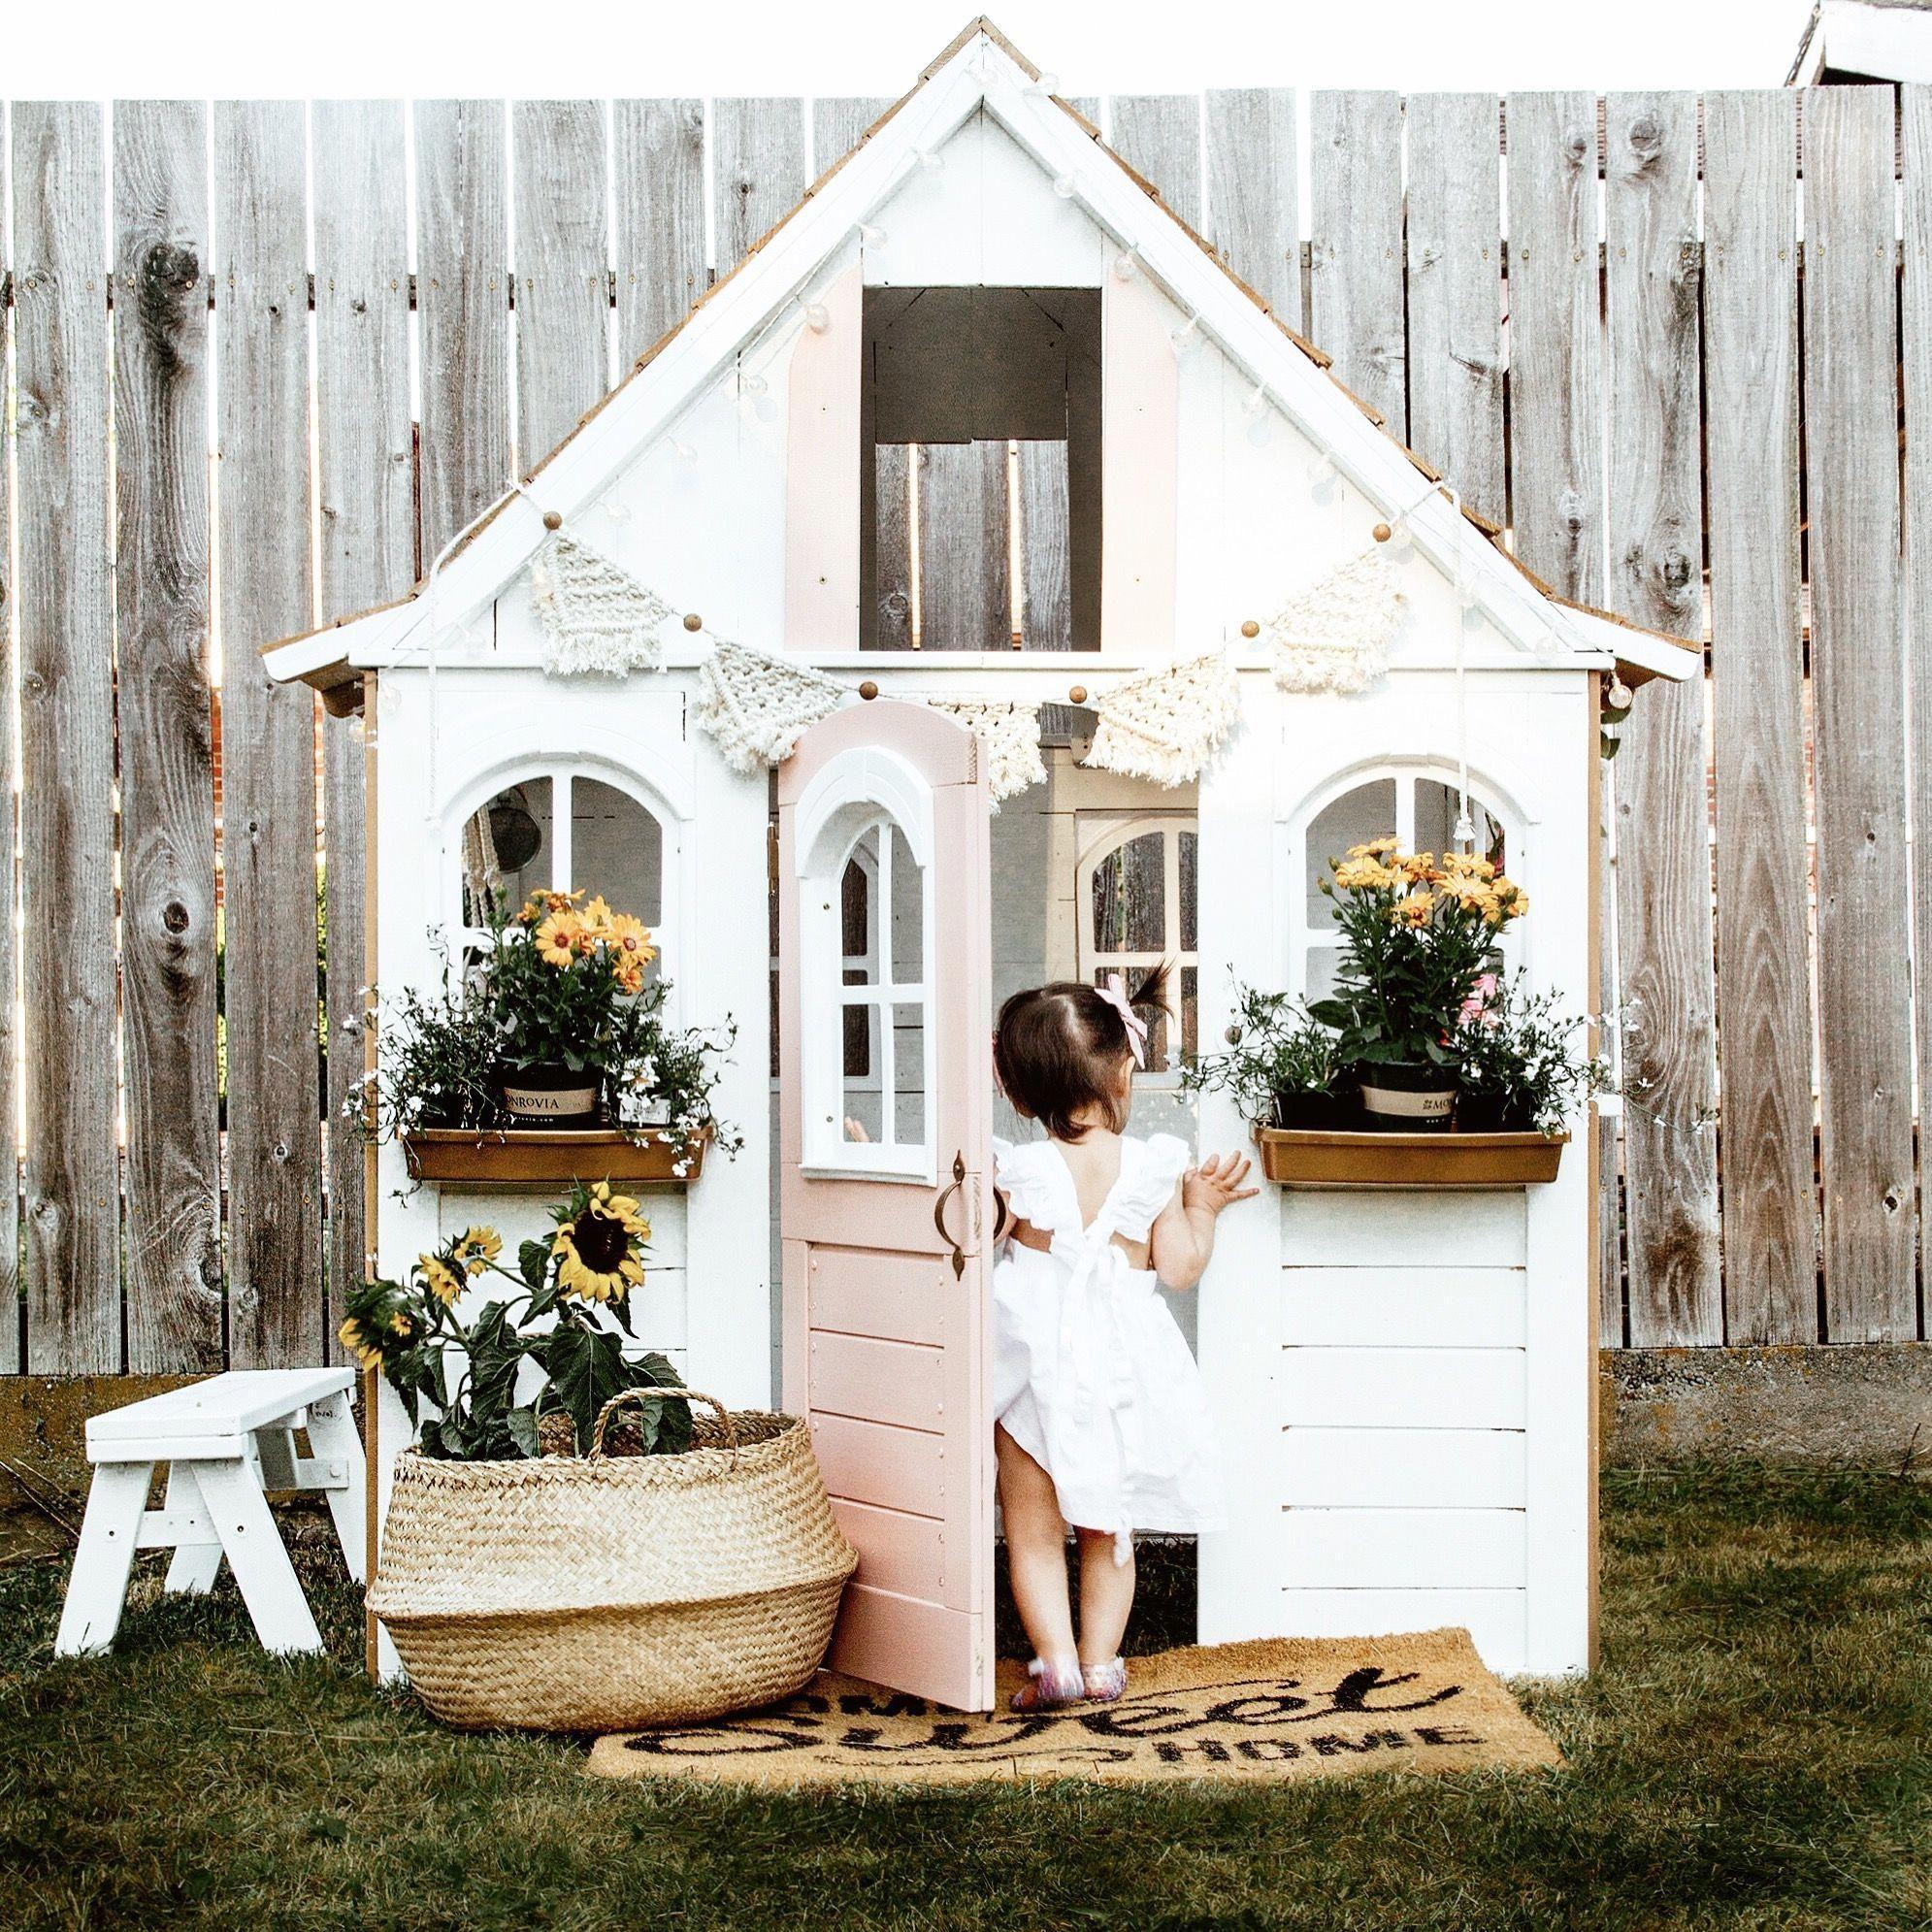 how to build a playhouse diy